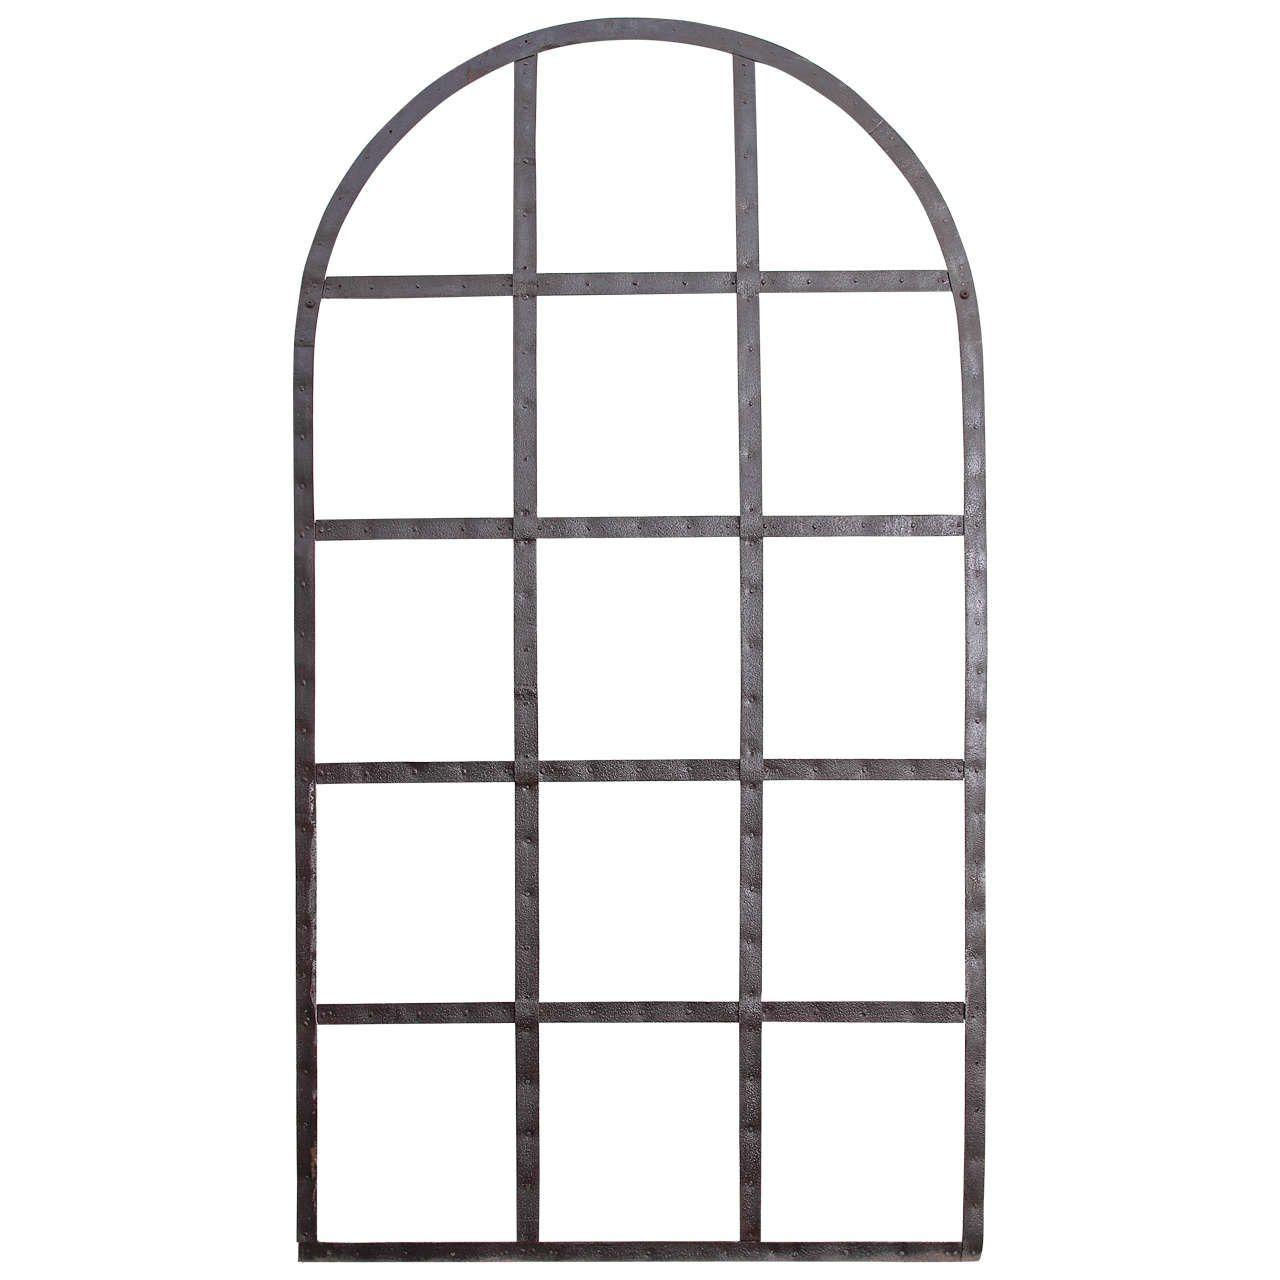 1280x1280 Industrial Window Frame Garden Trellis, Circa Abby's Barn